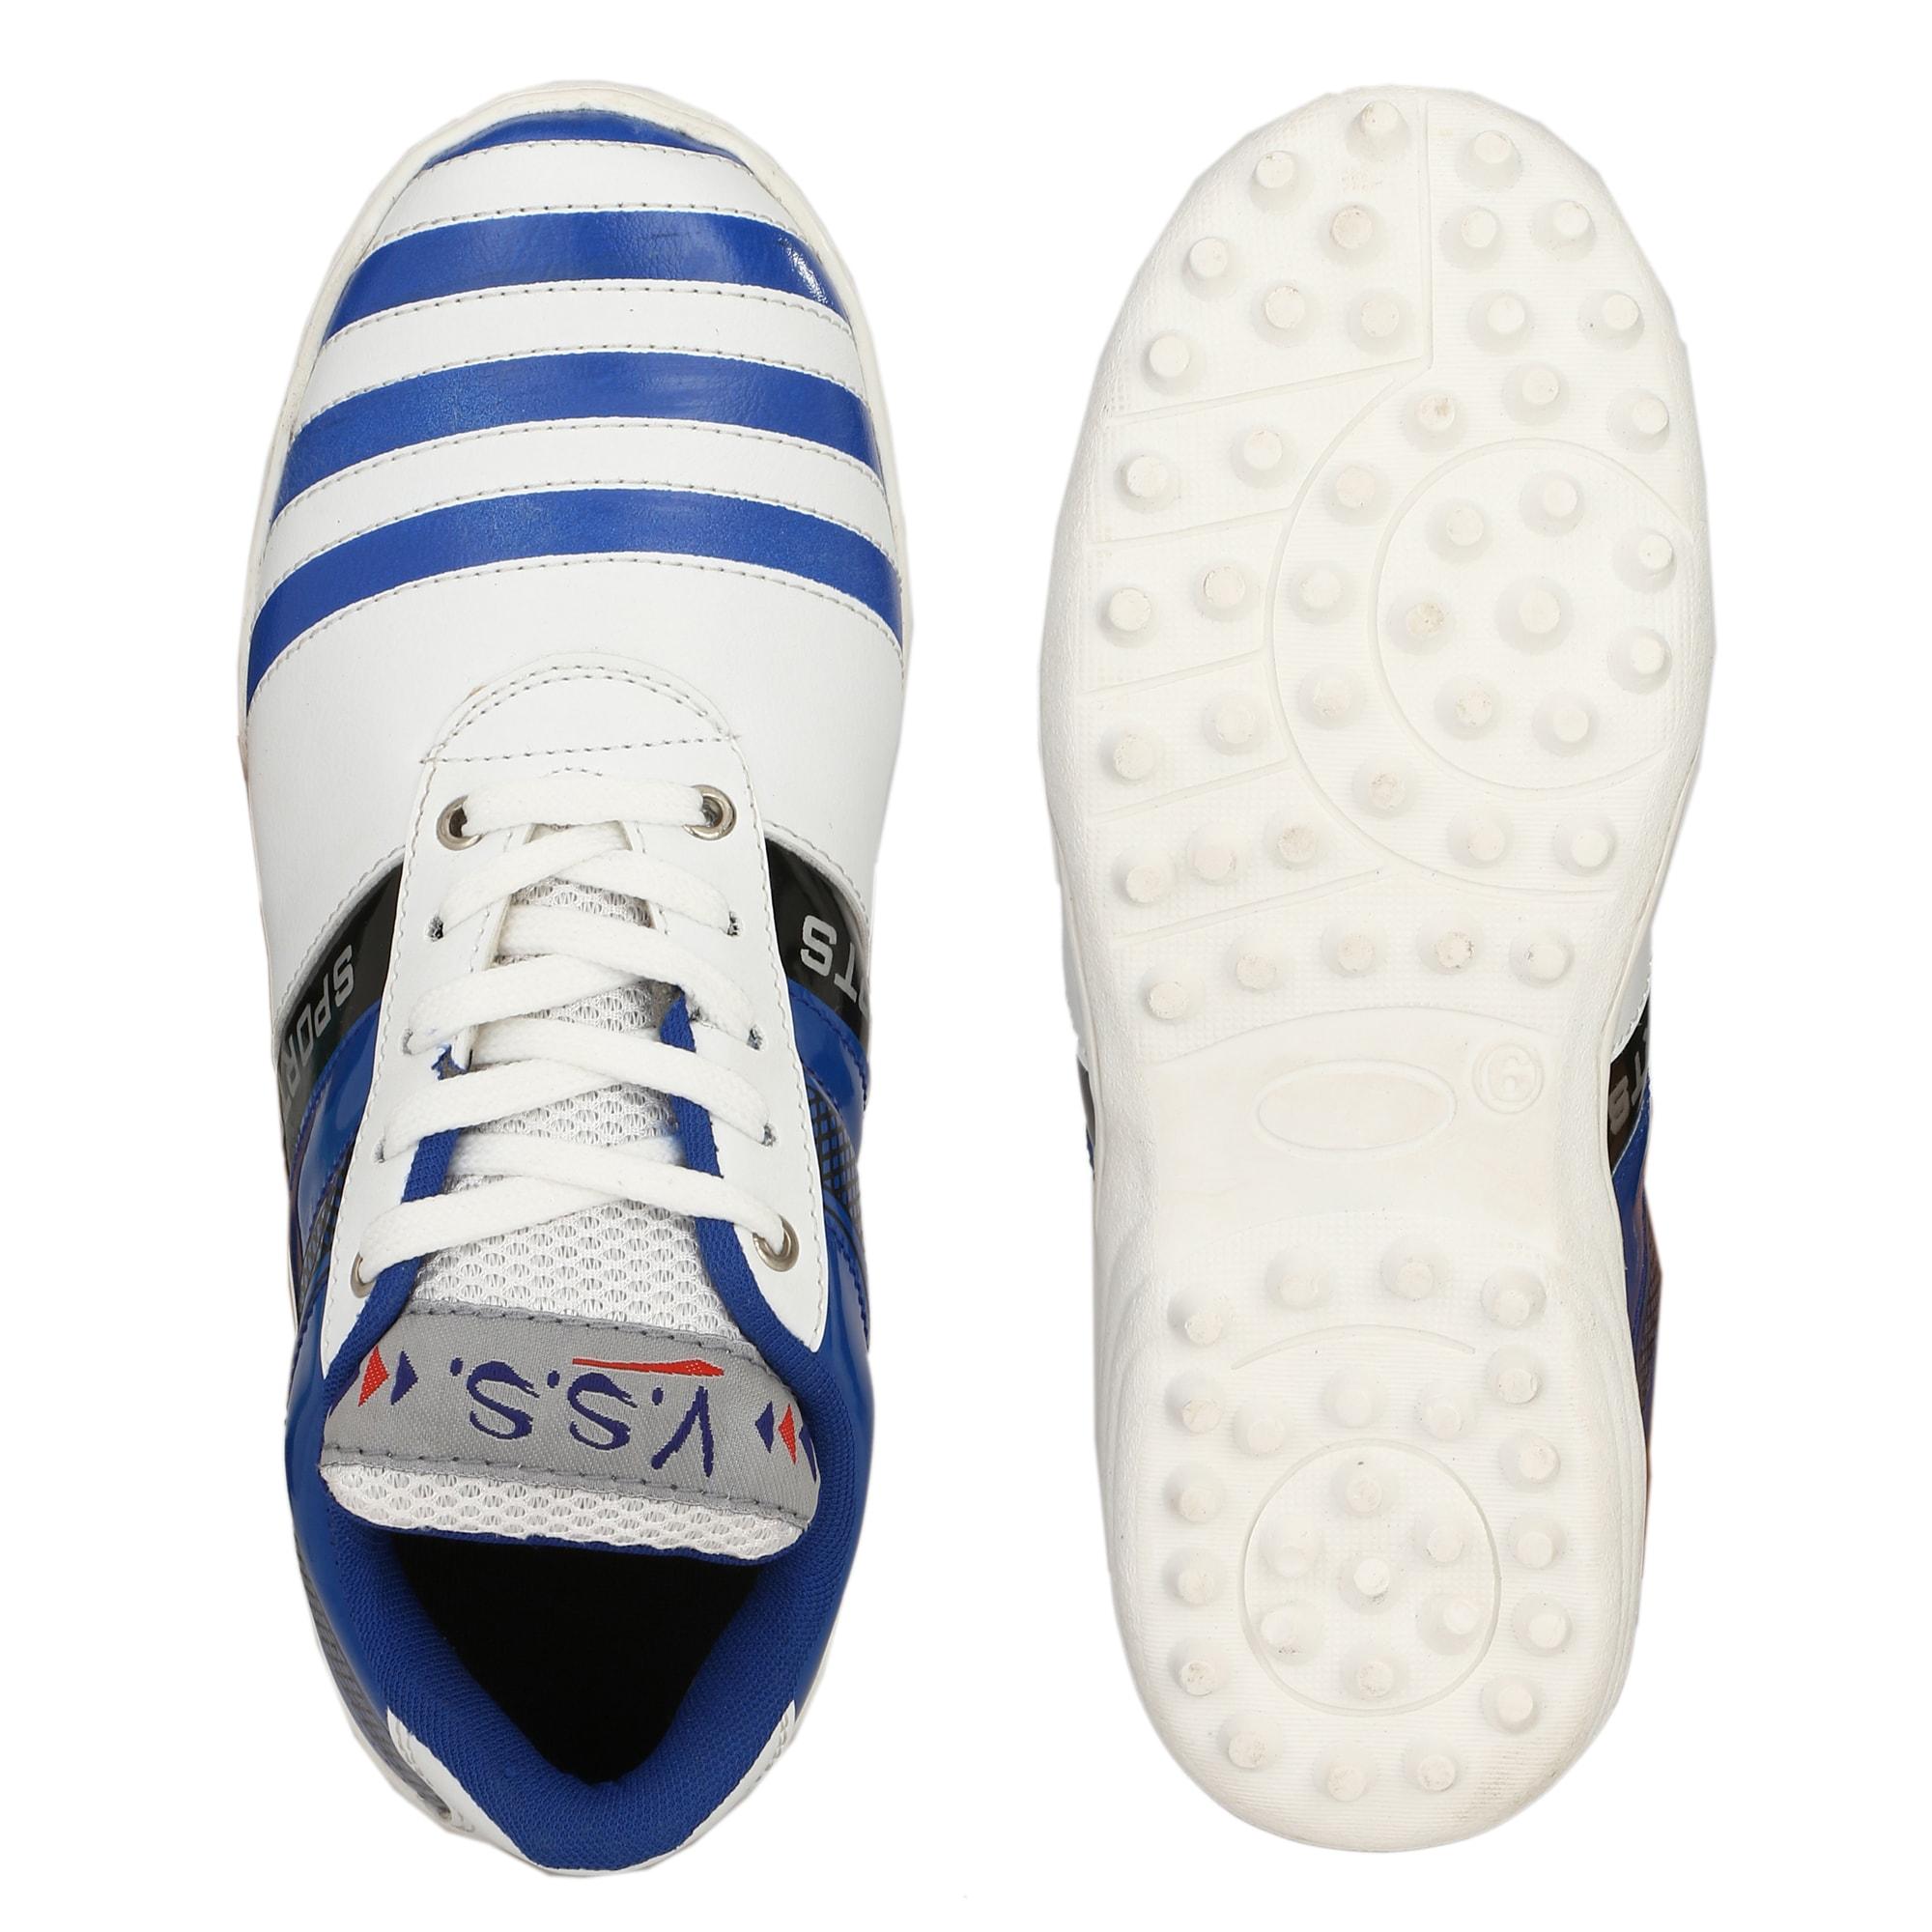 VSS Men's Blue Synthetic Leather Cricket Sports Shoes BCK047-BLUE (Blue,6-10,8 PAIR)